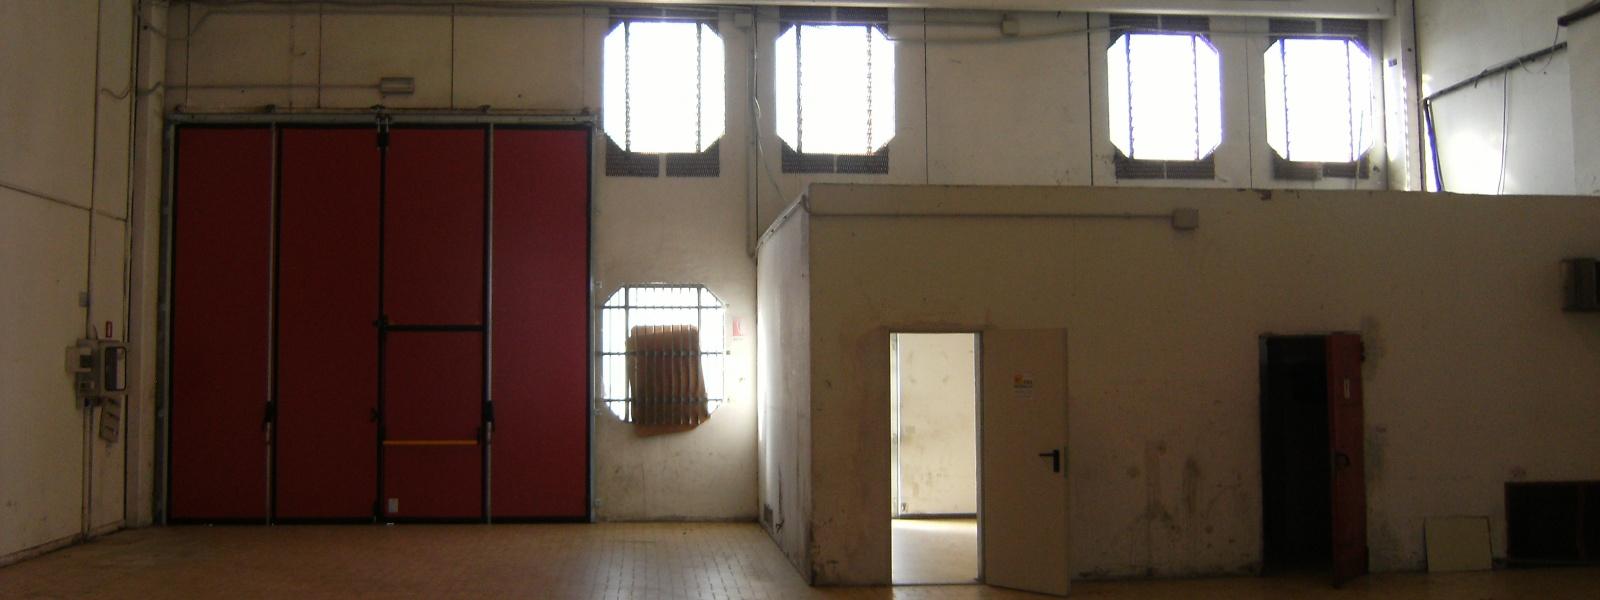 2 BagniBagni,Capannone Industriale,1067